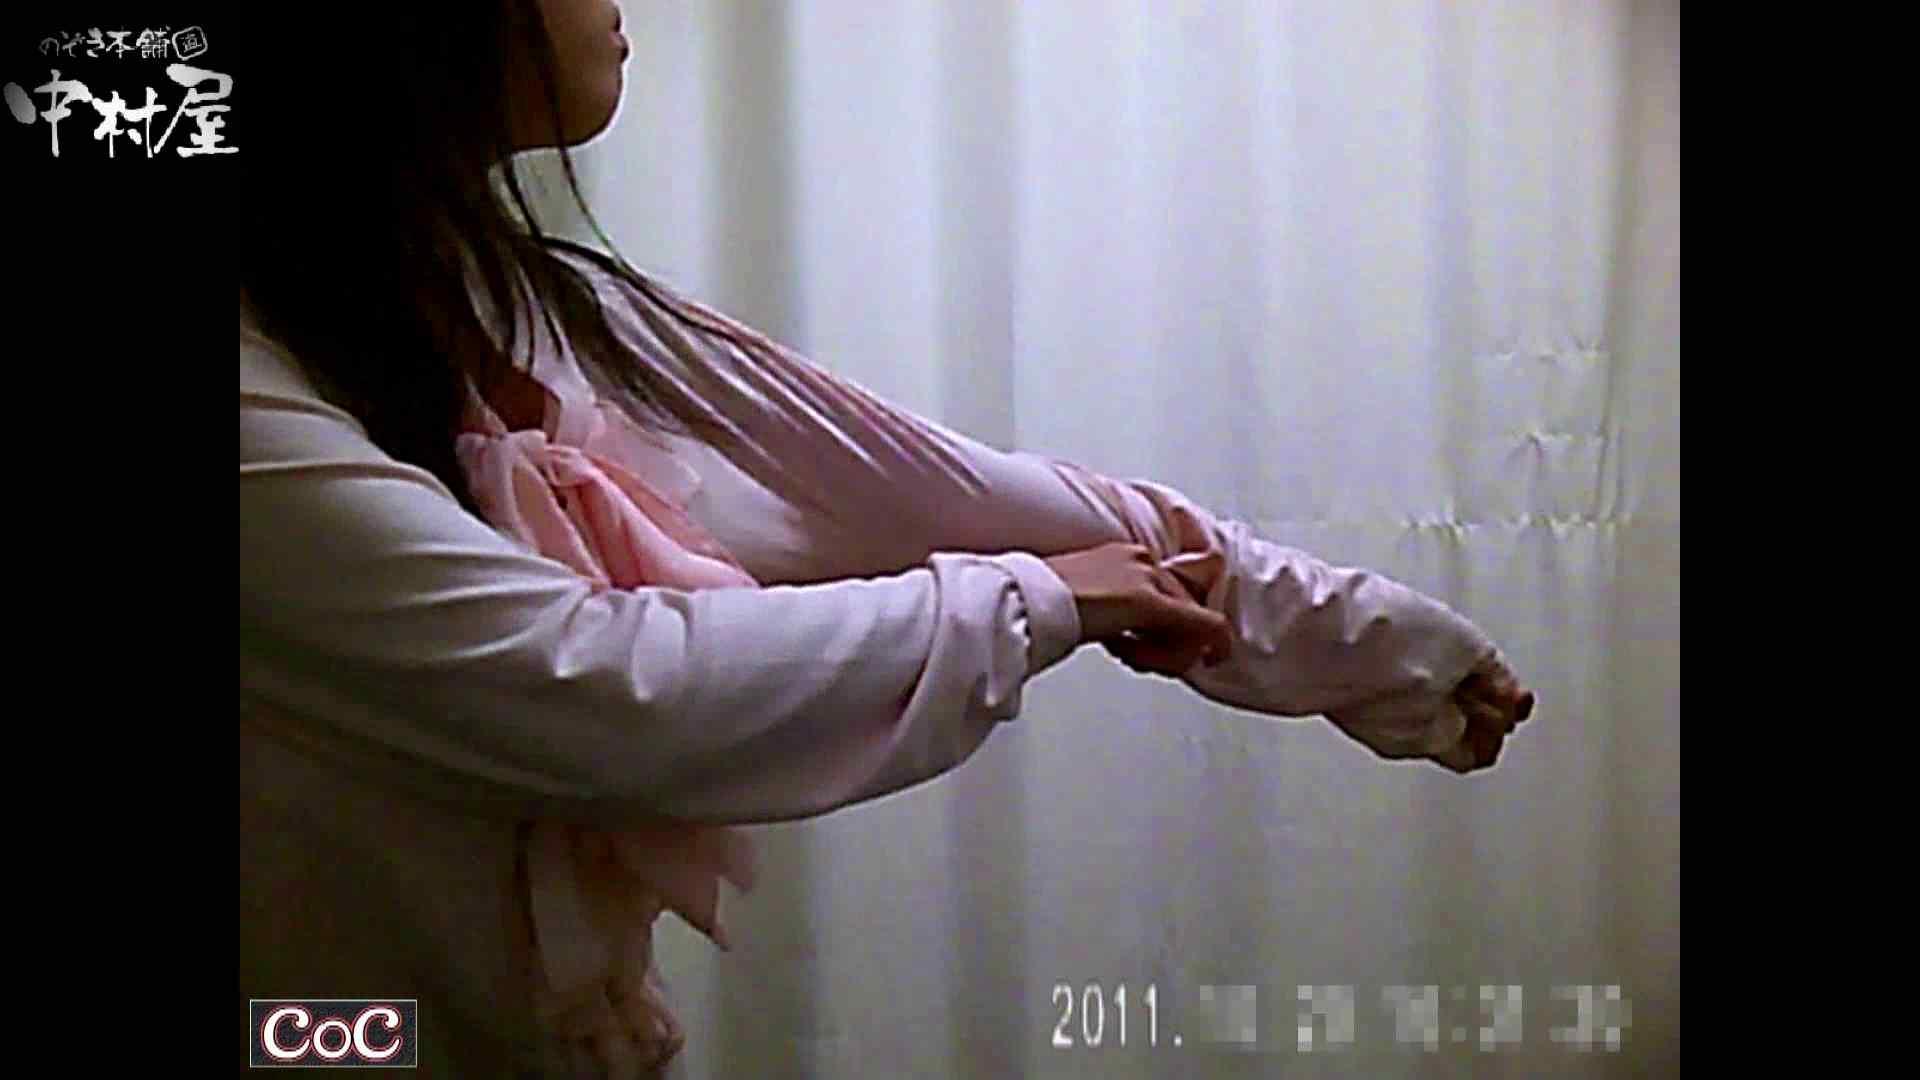 Doctor-X元医者による反抗vol.63 OLハメ撮り  61Pix 35